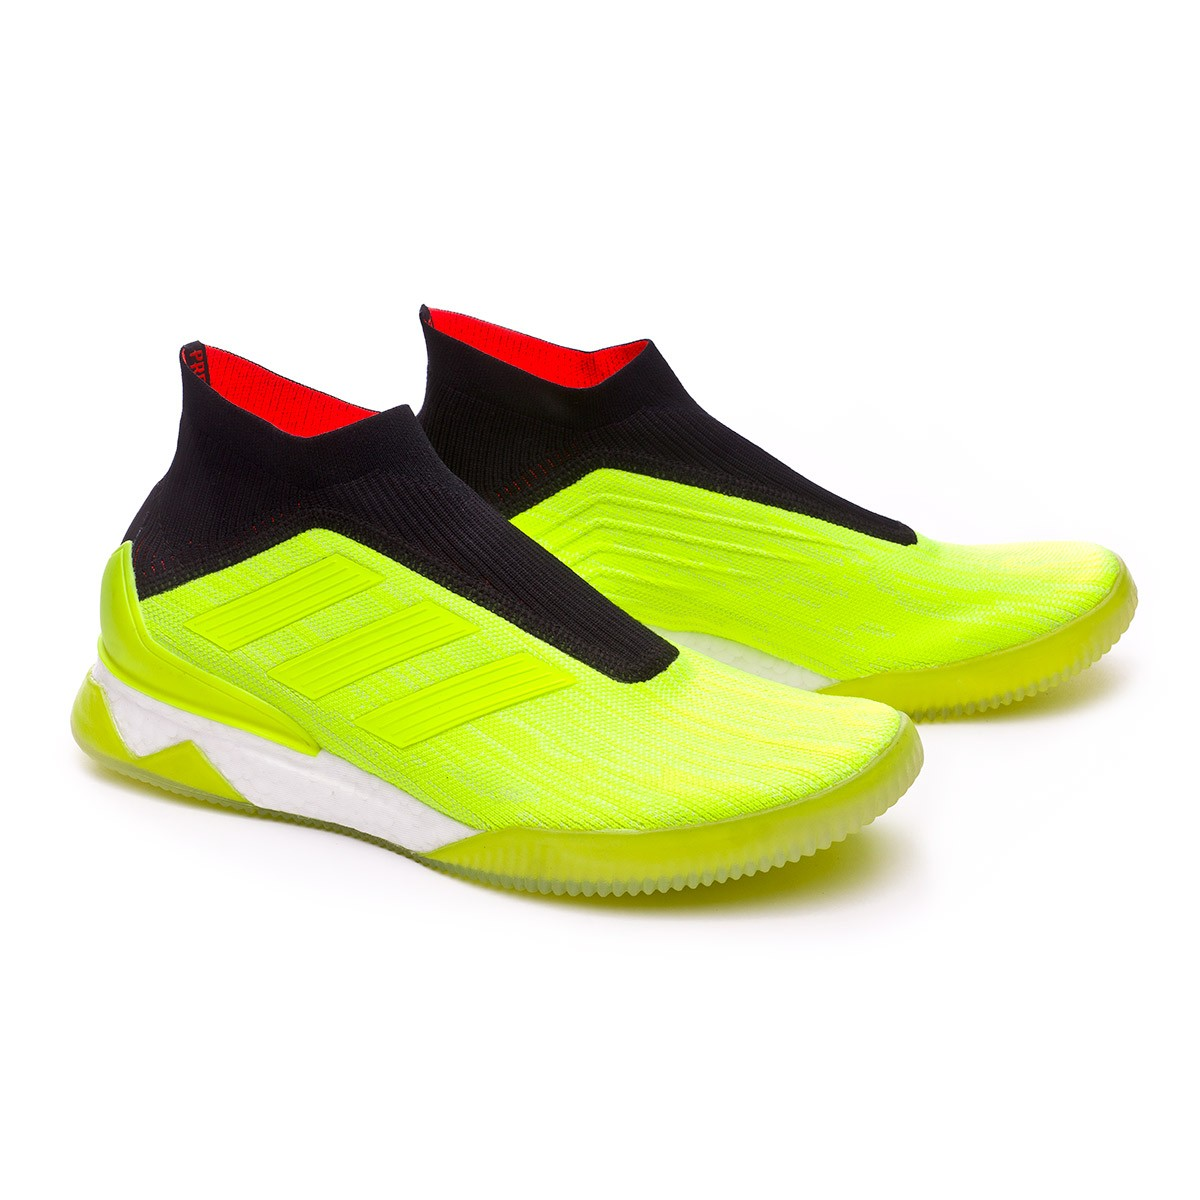 0d41d842105 adidas Predator Tango 18+ TR UltraBoost Trainers. Solar yellow-Solar red ...